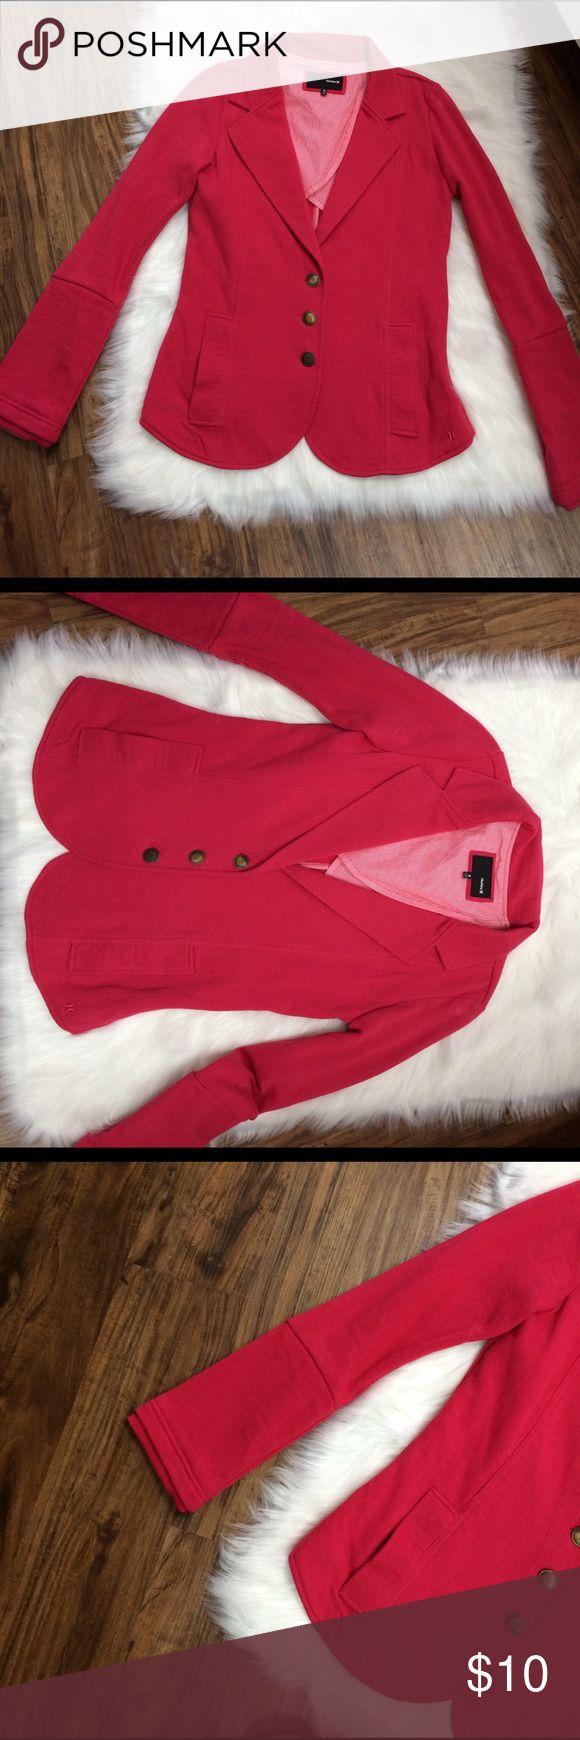 Hurley Blazer Brand New - flared sleeves - no trades Hurley Jackets & Coats Blazers